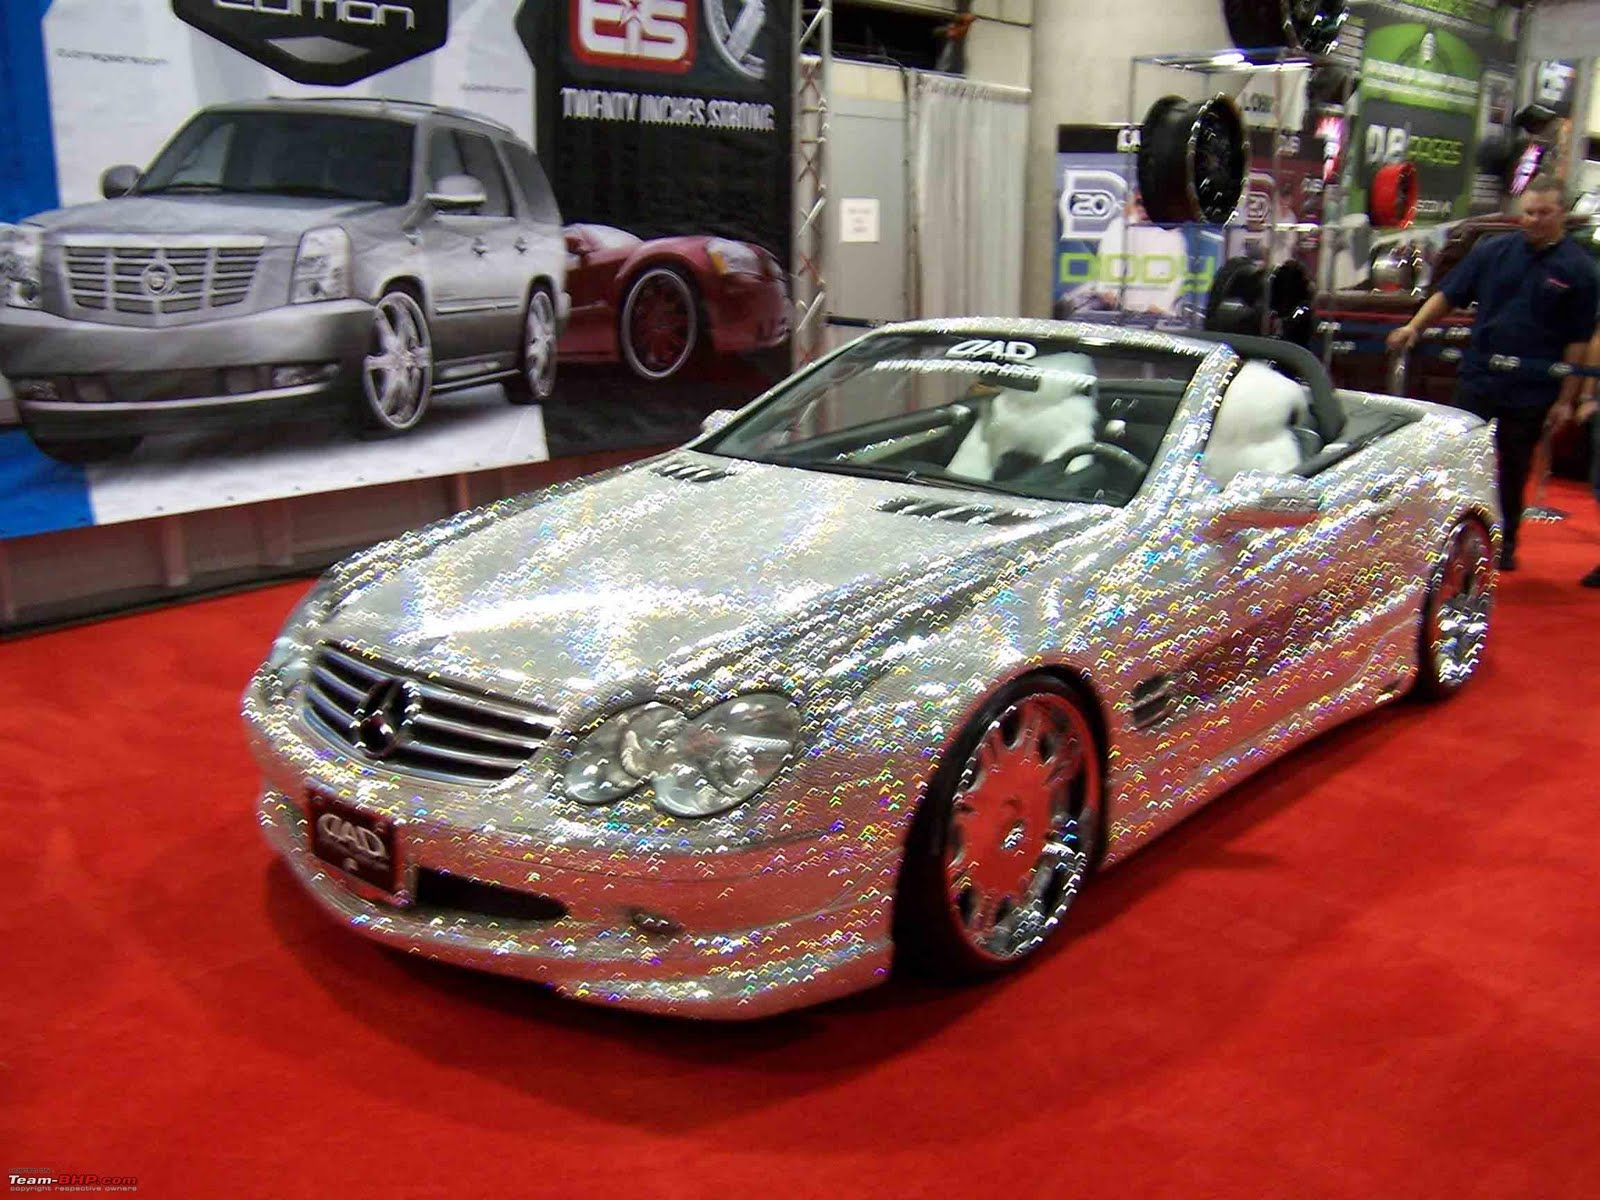 Bikes And Cars Wallpapers Diamond Car Dream Car